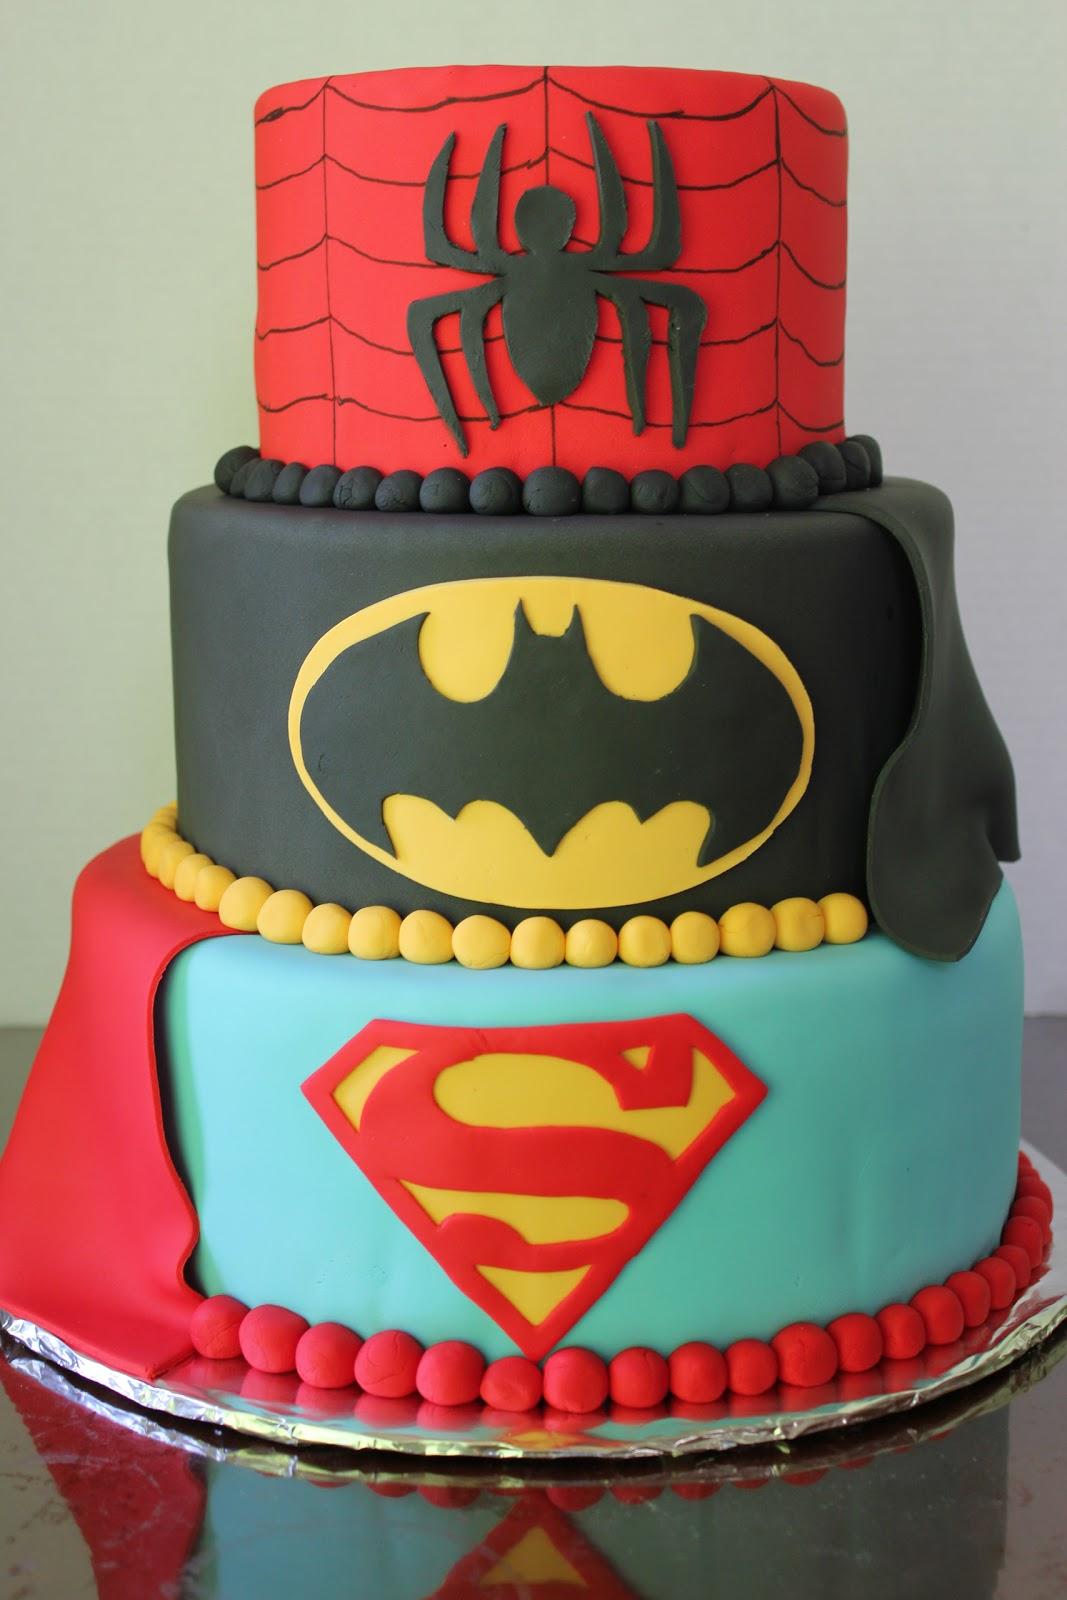 21 Superhero Cake Designs That Will Destroy Any Villain ...  |Superhero Cakes